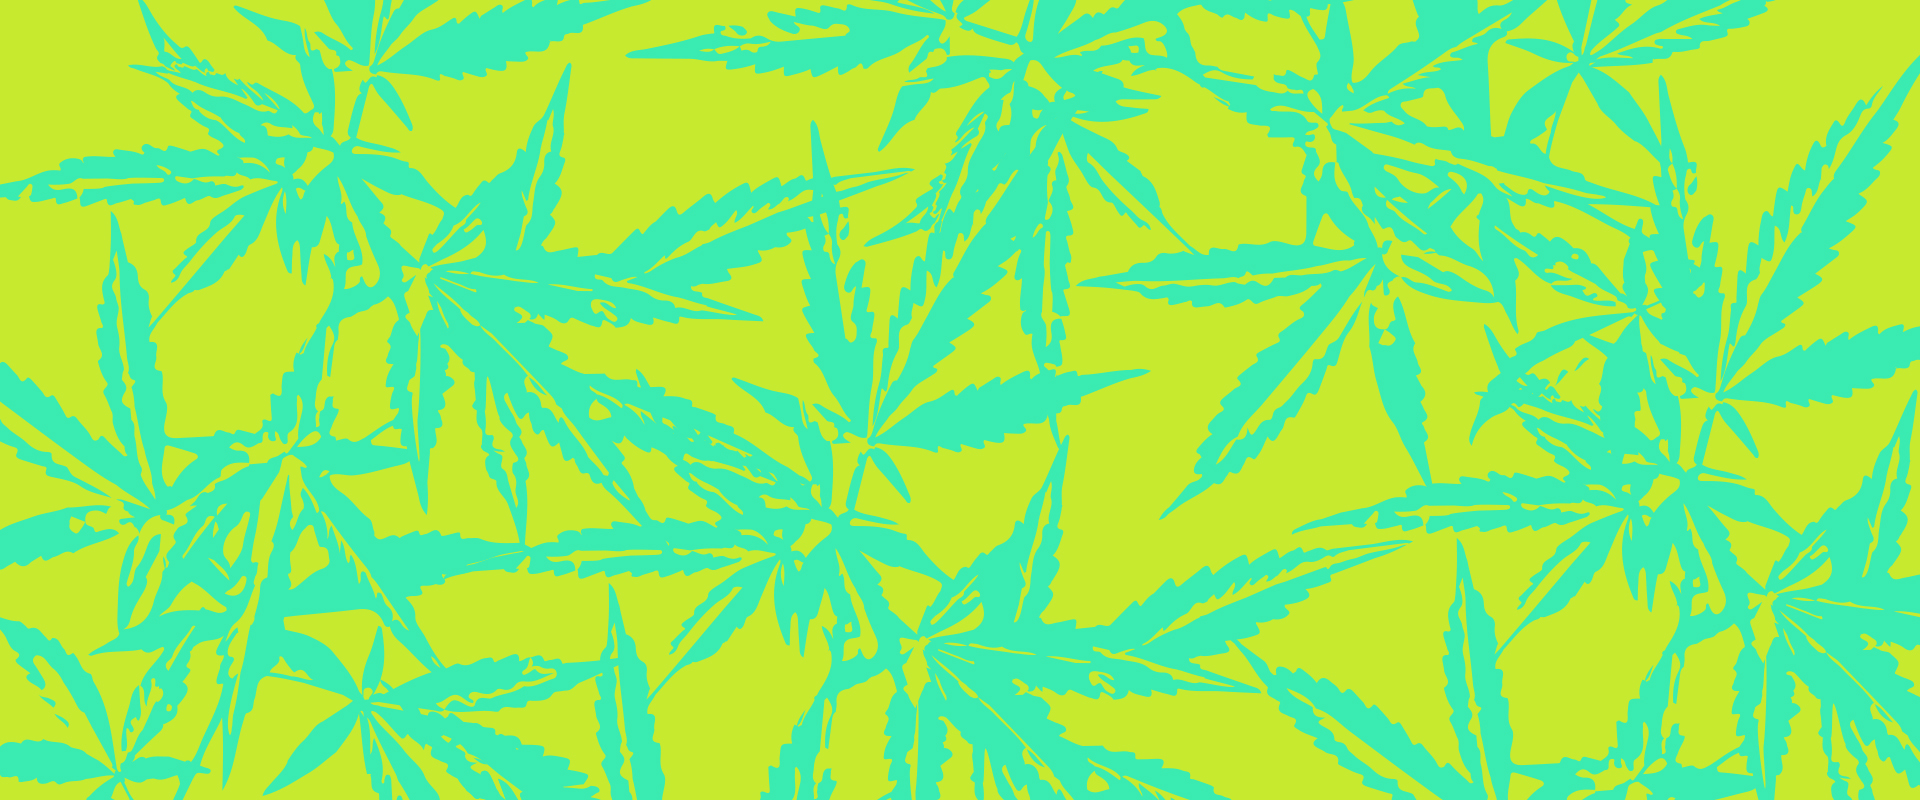 Ten17 Green Cannabis Graphic Banner